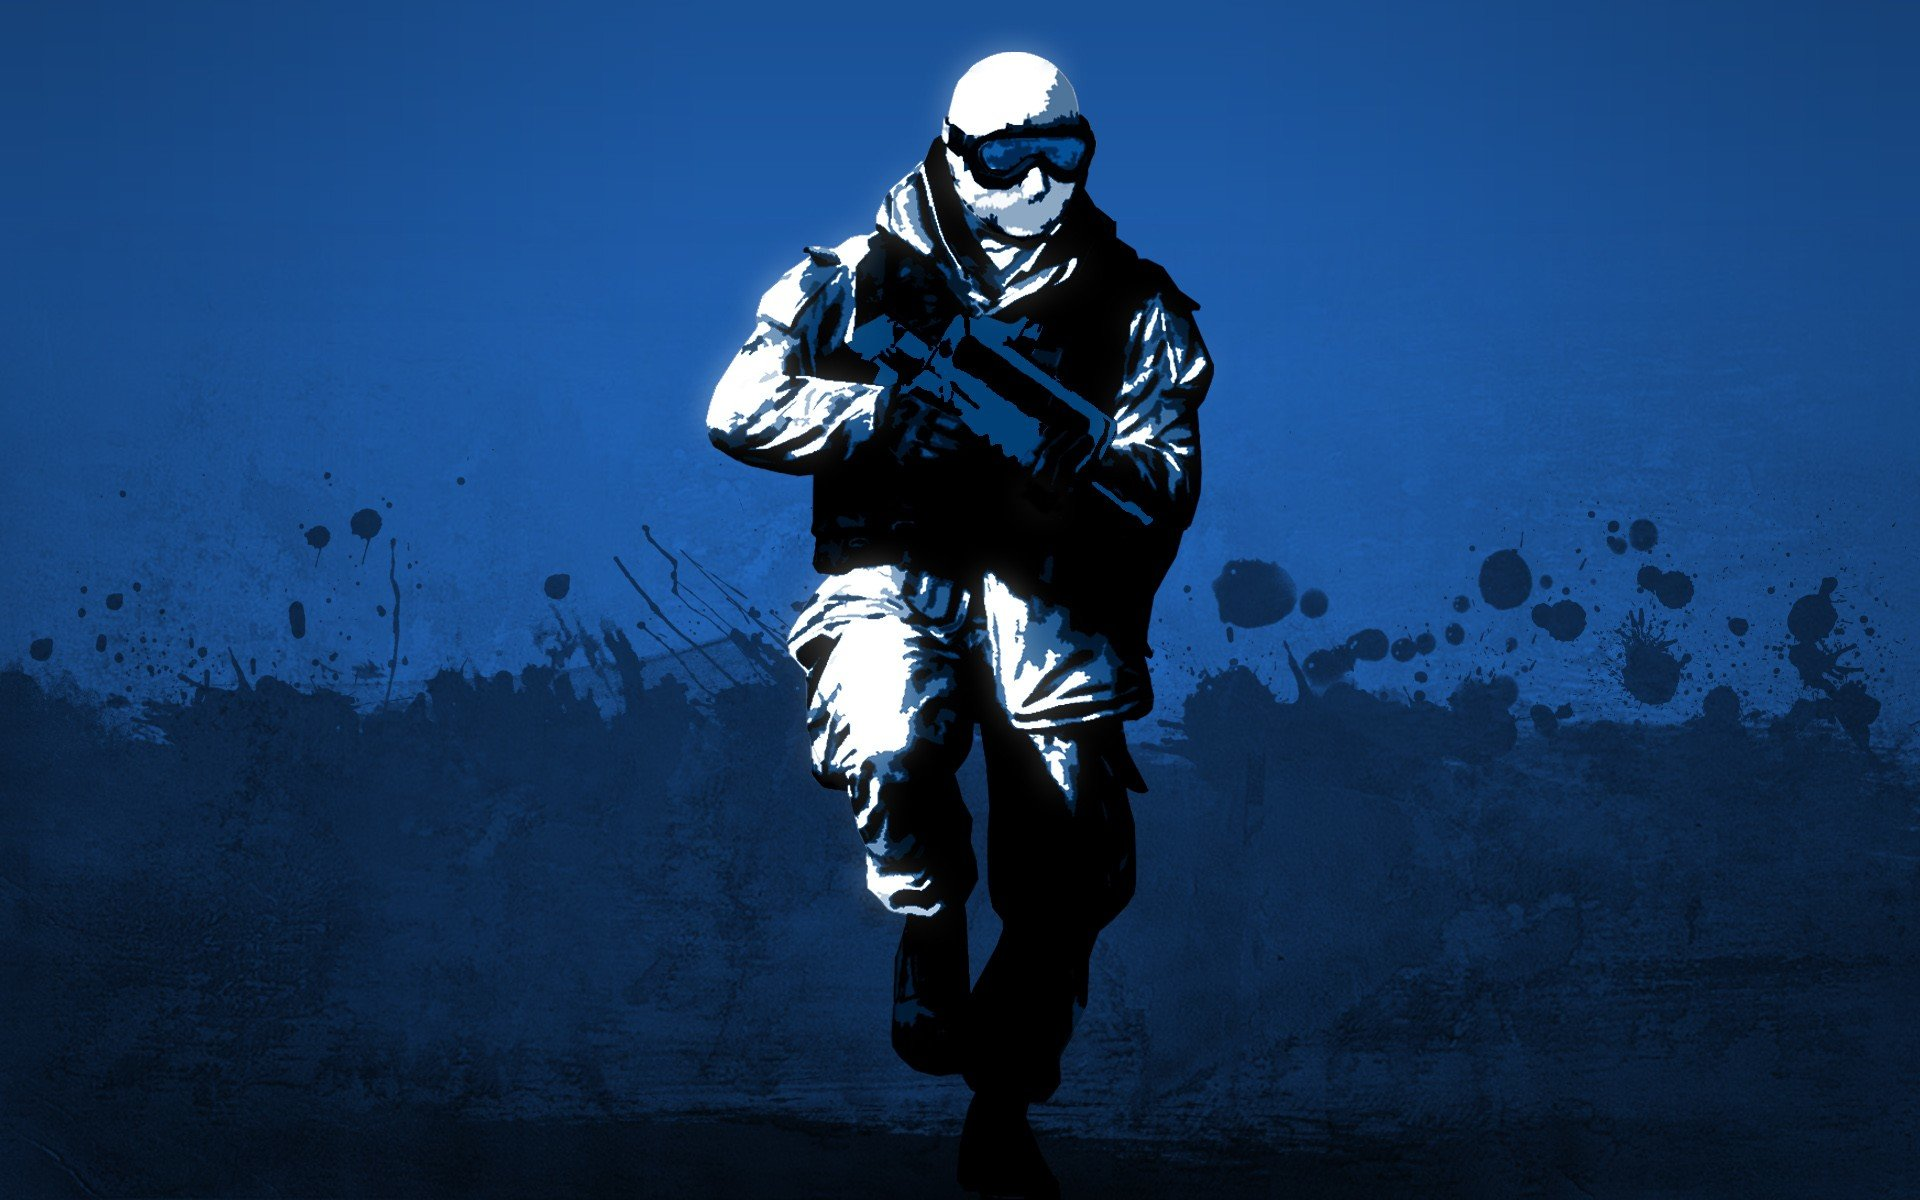 Best Call Of Duty Modern Warfare 2 MW2 Wallpaper ID326511 For